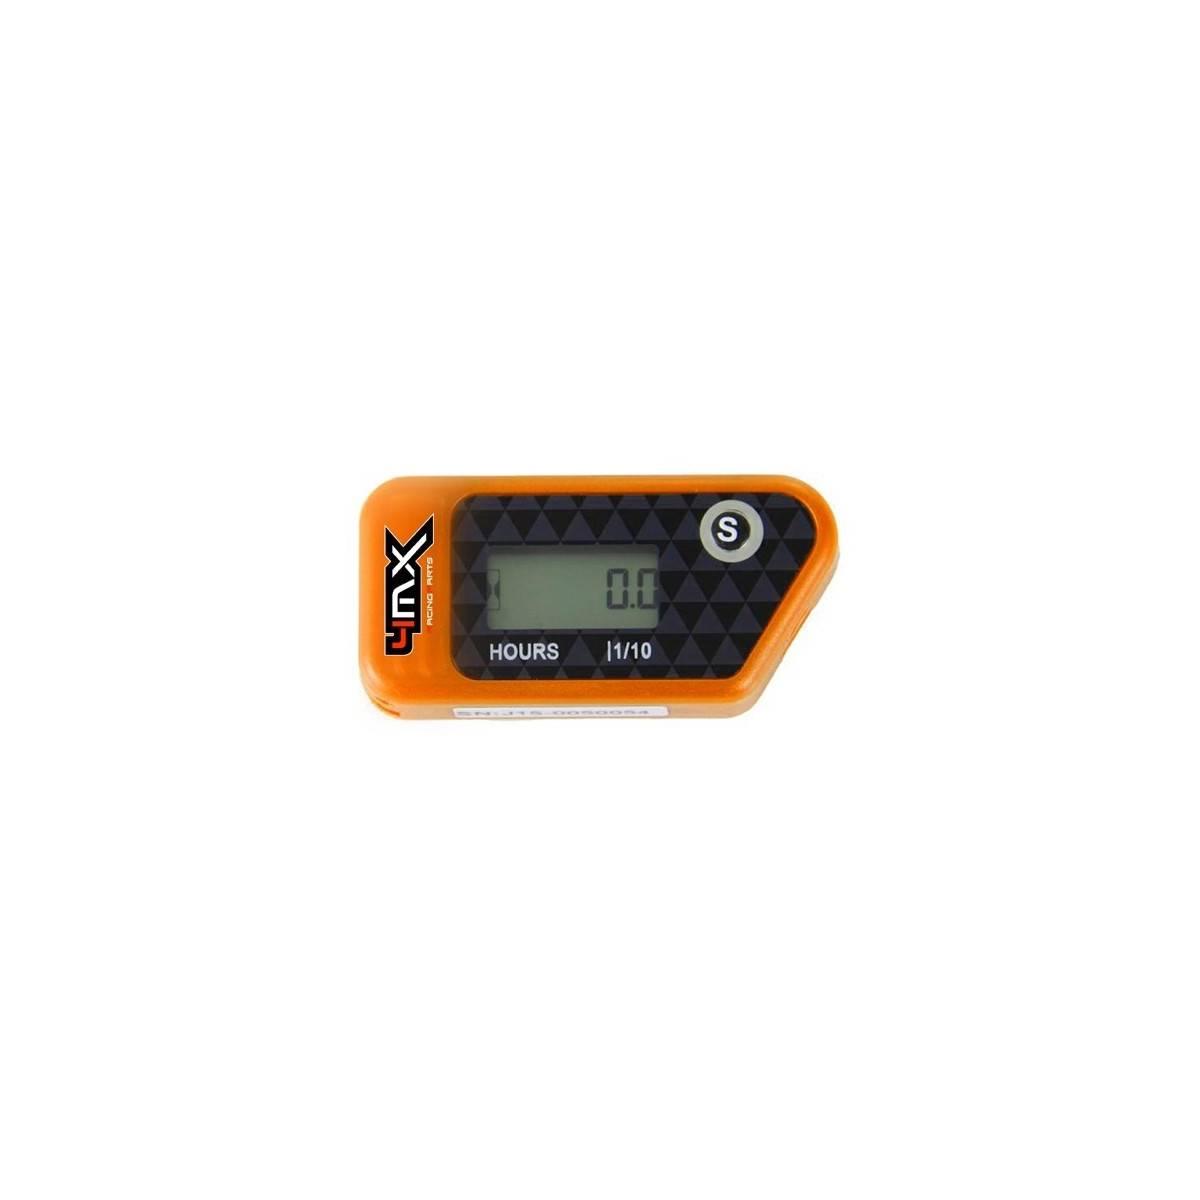 4MXWHM-NR - Reloj Cuenta Horas 4Mx Vibracion Naranja